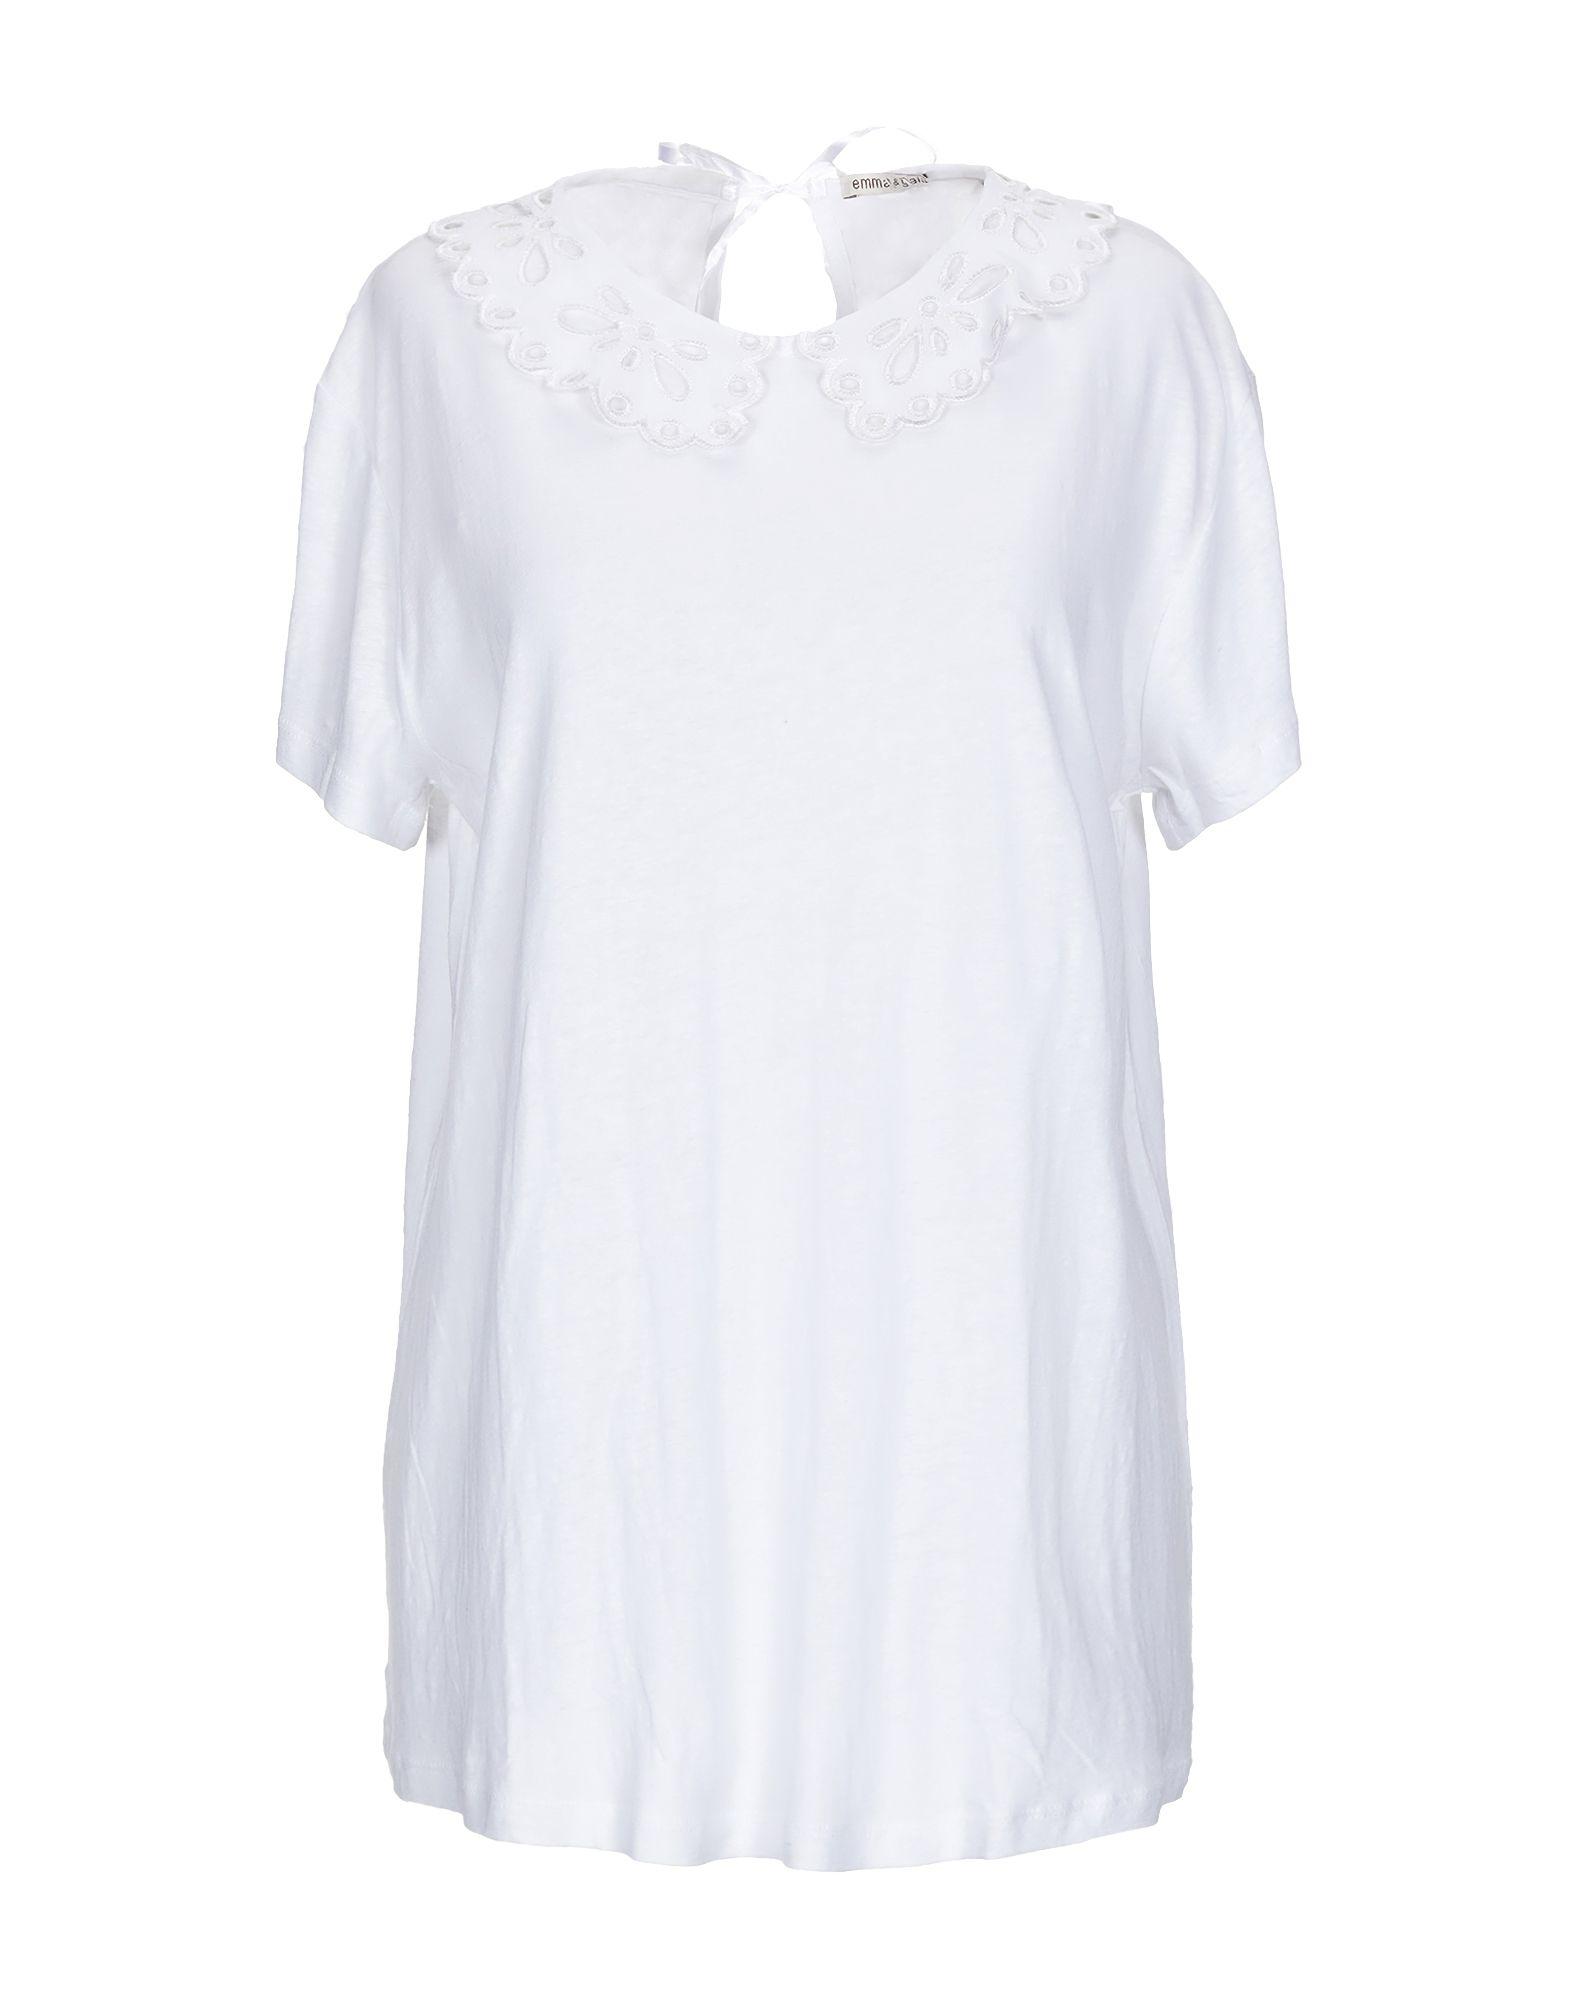 EMMA & GAIA Футболка dress emma monti платья и сарафаны приталенные